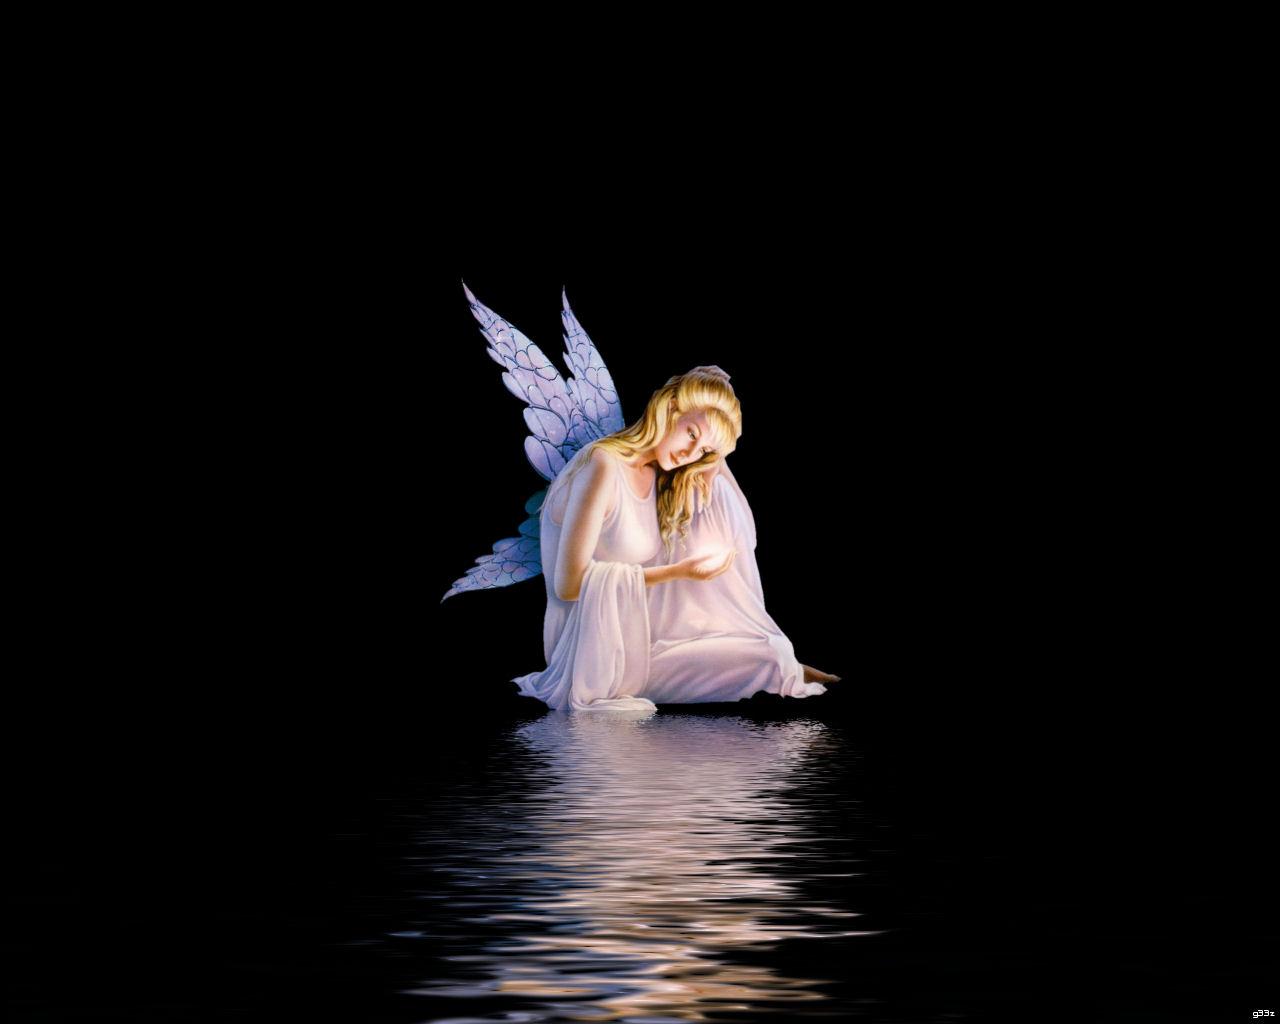 angel   Angels Photo 30195784 1280x1024